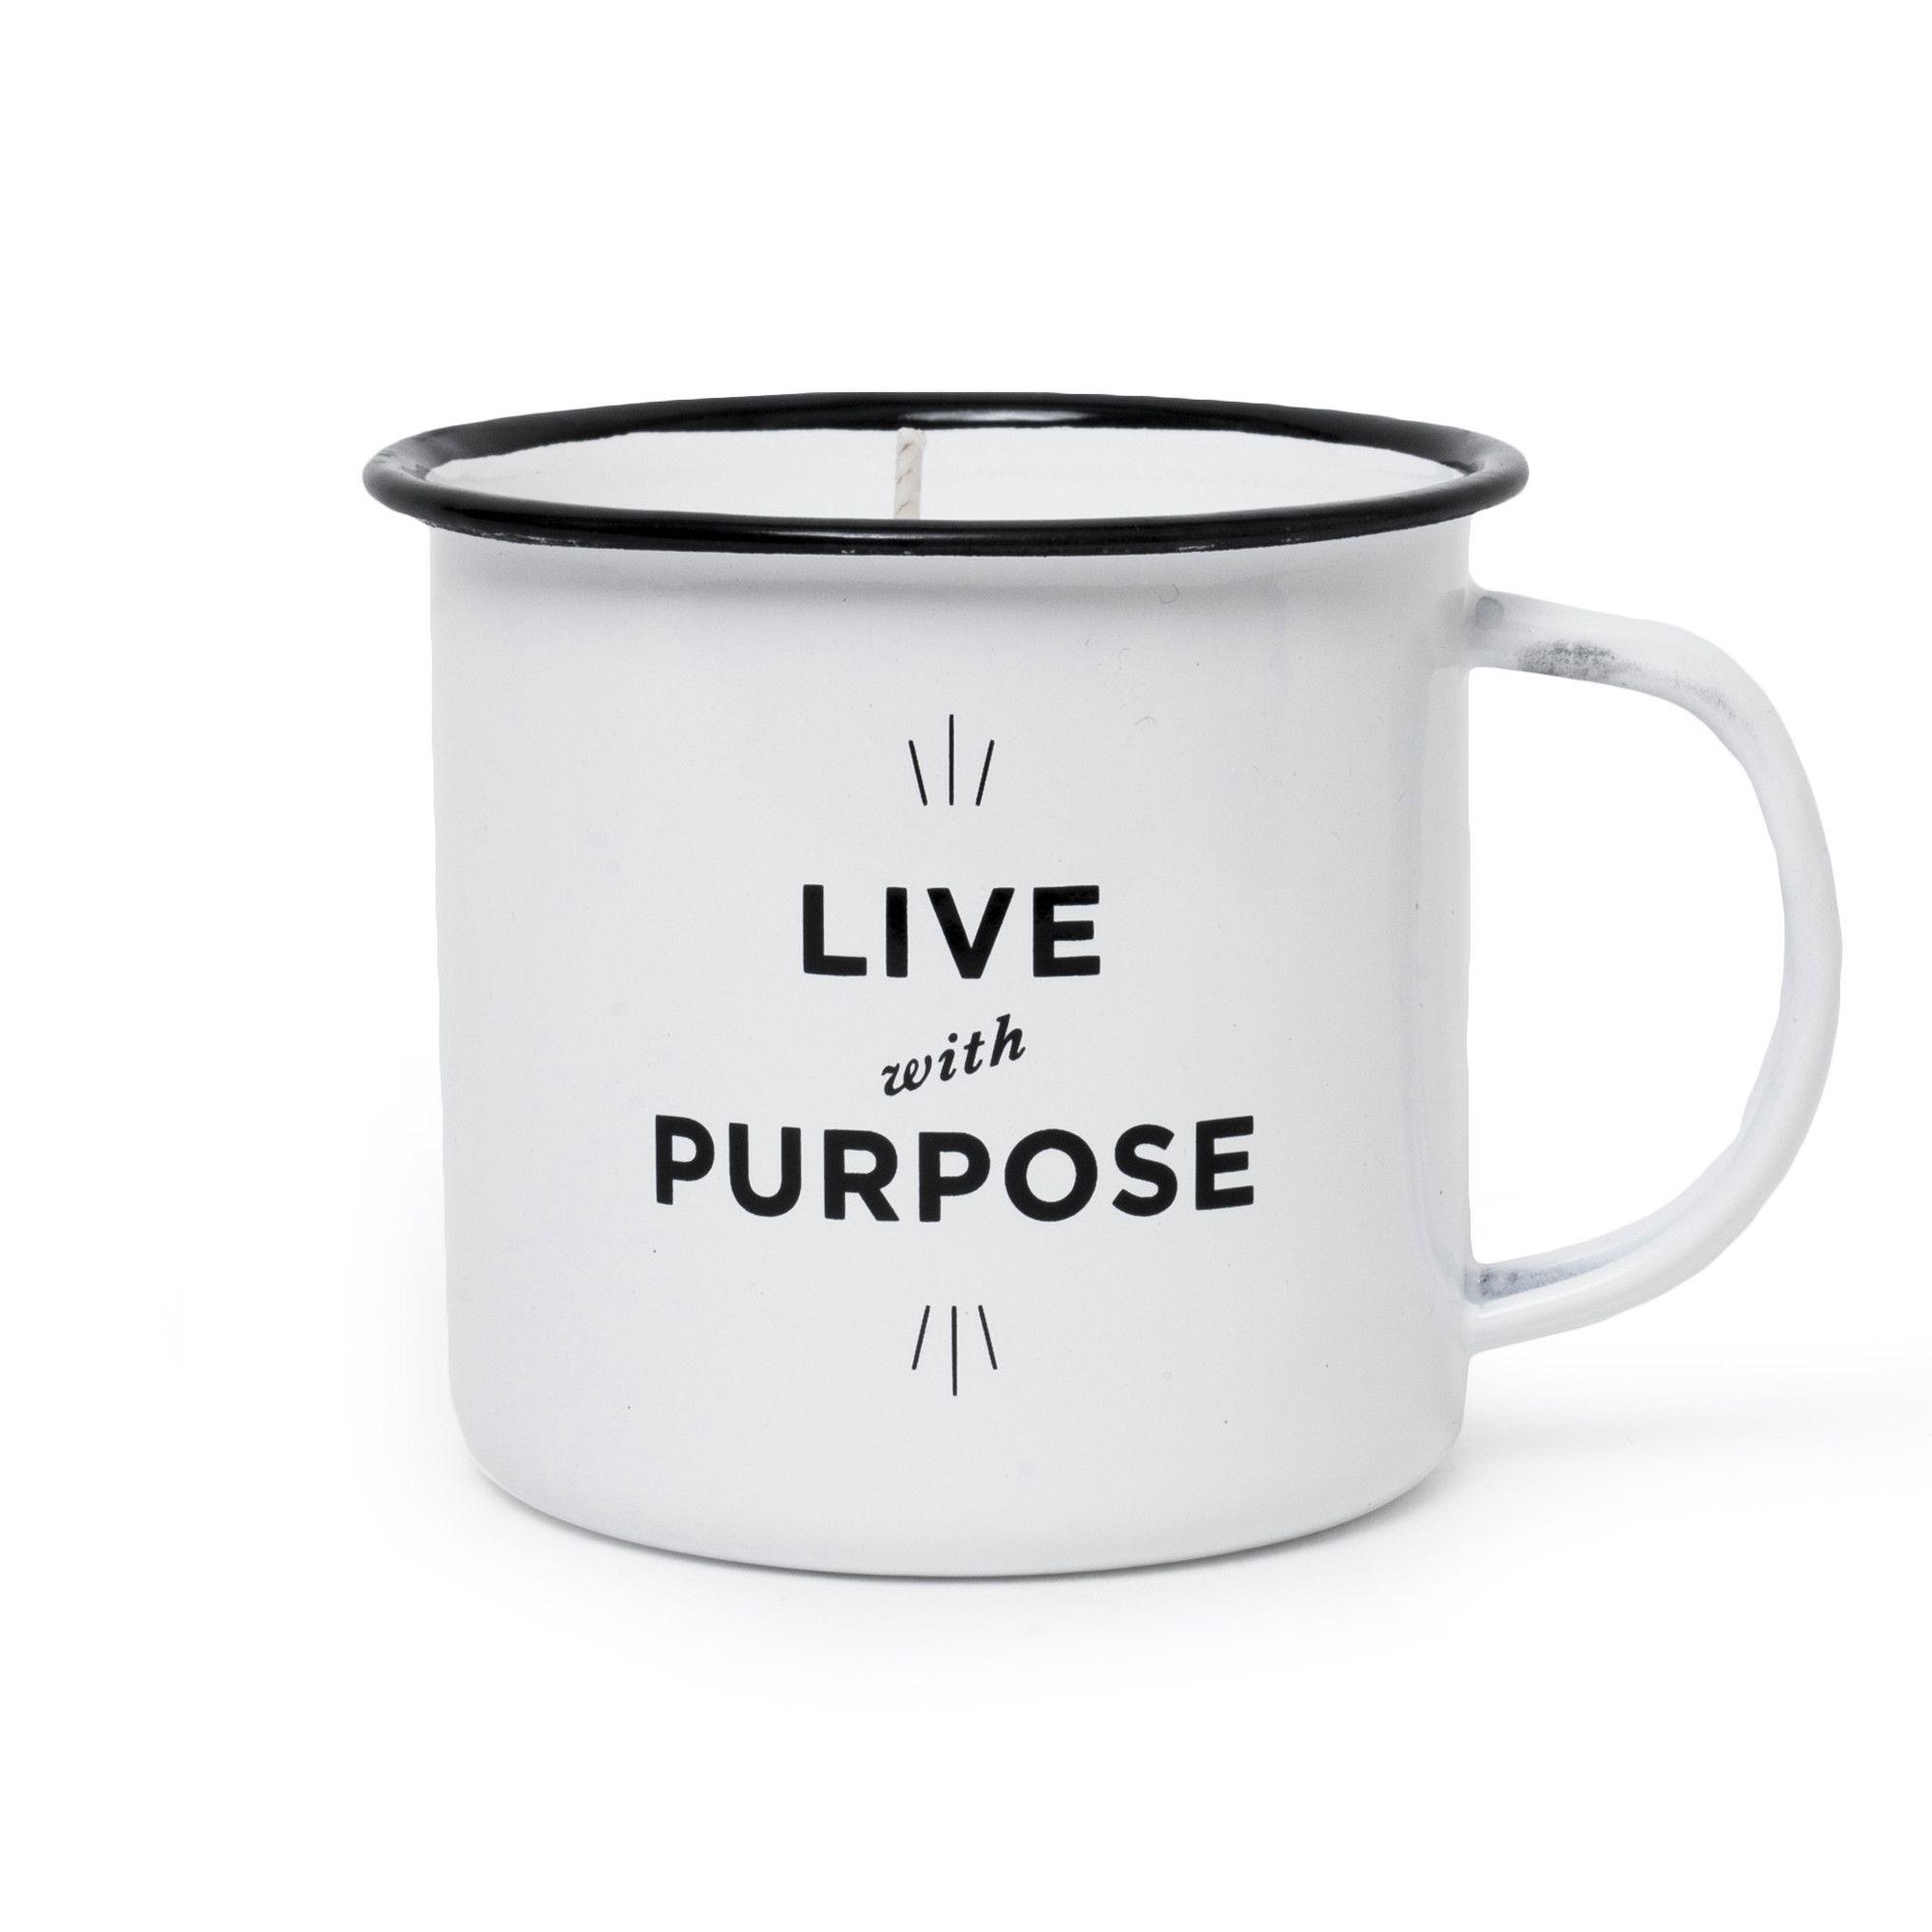 Live With Purpose Camp Mug Candle livewithpurpose candle